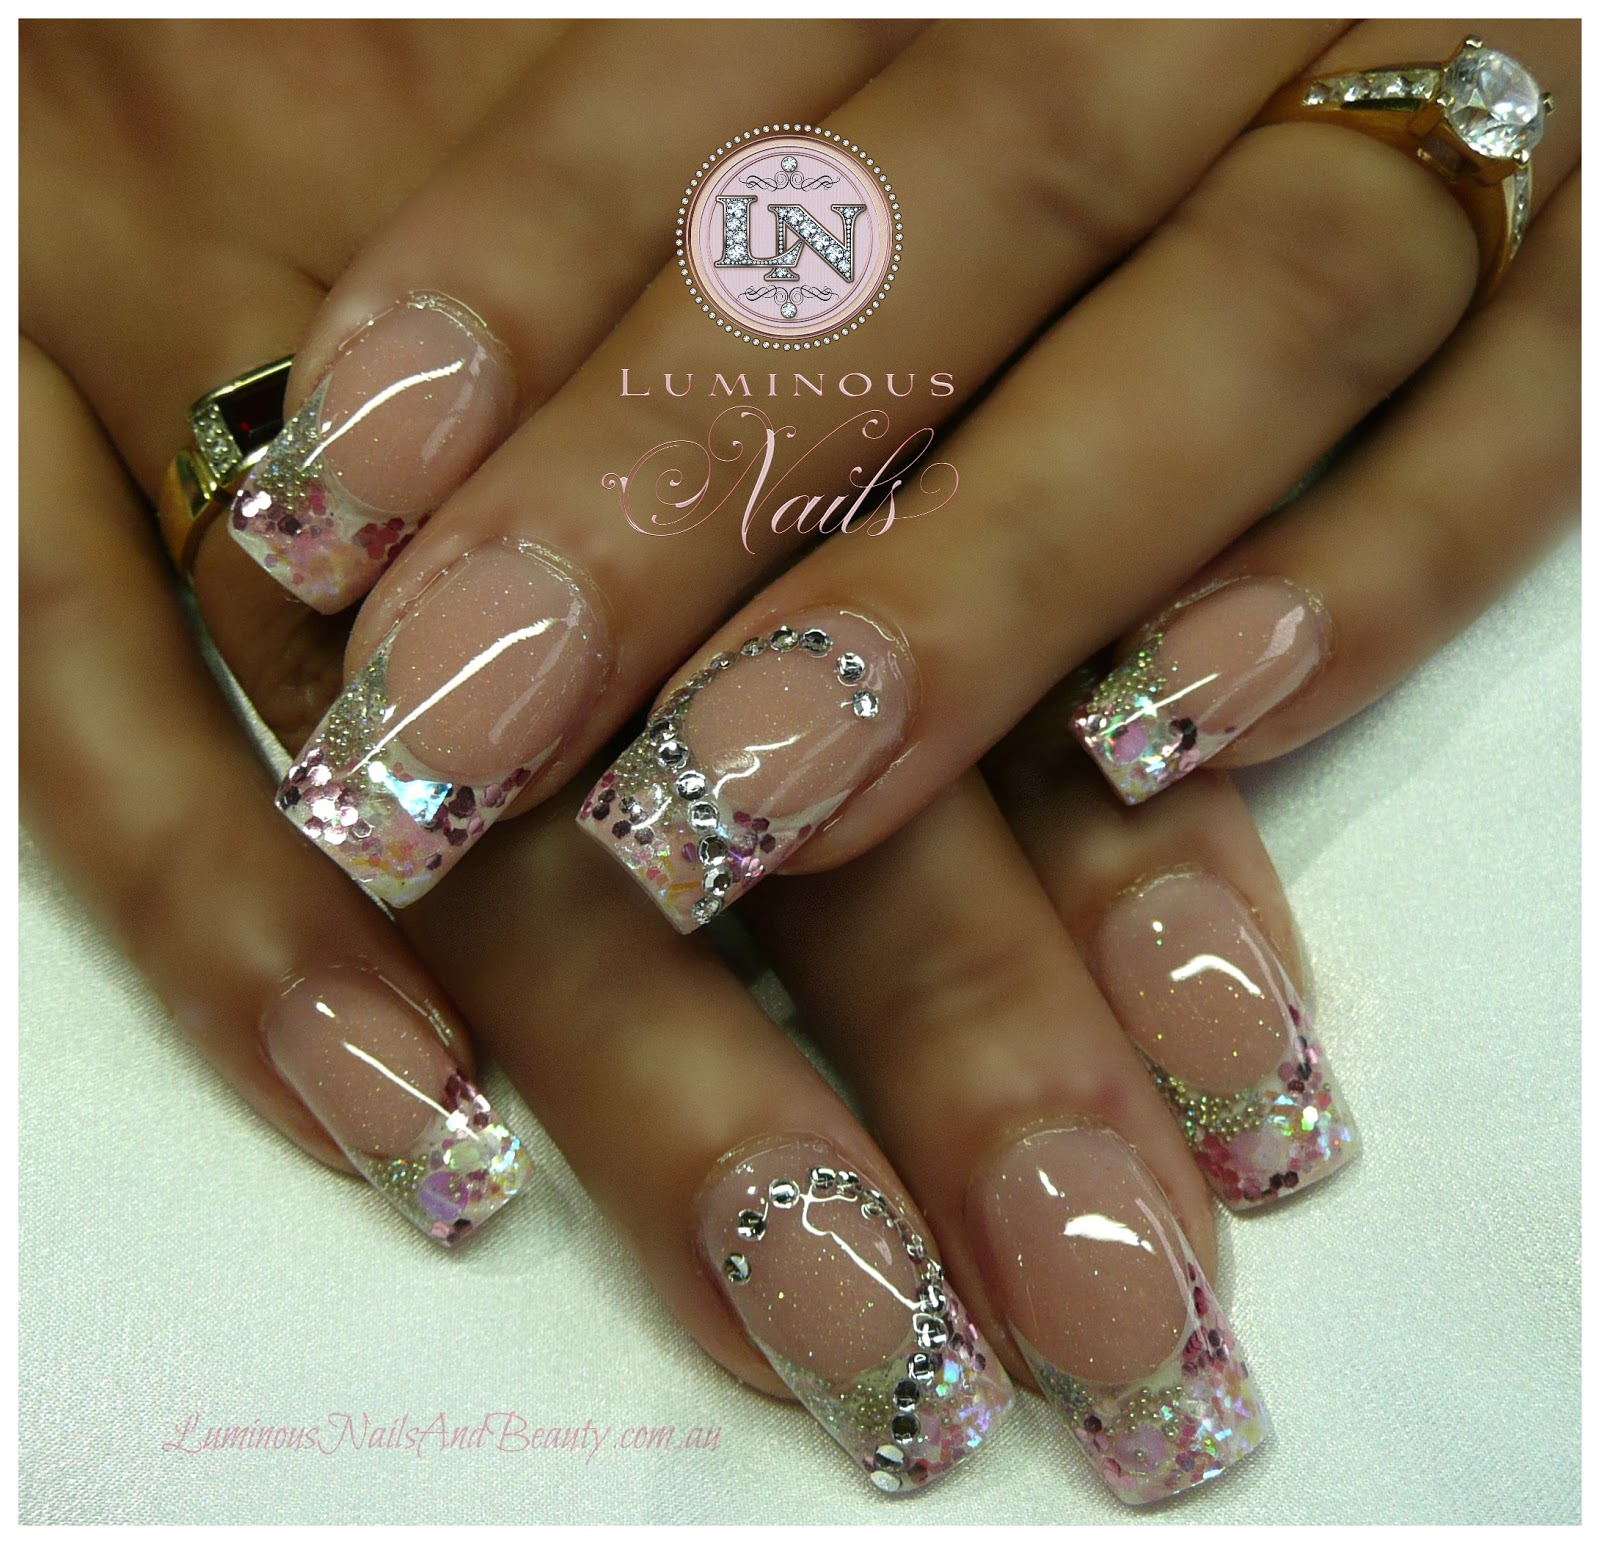 Luminous Nails: November 2012